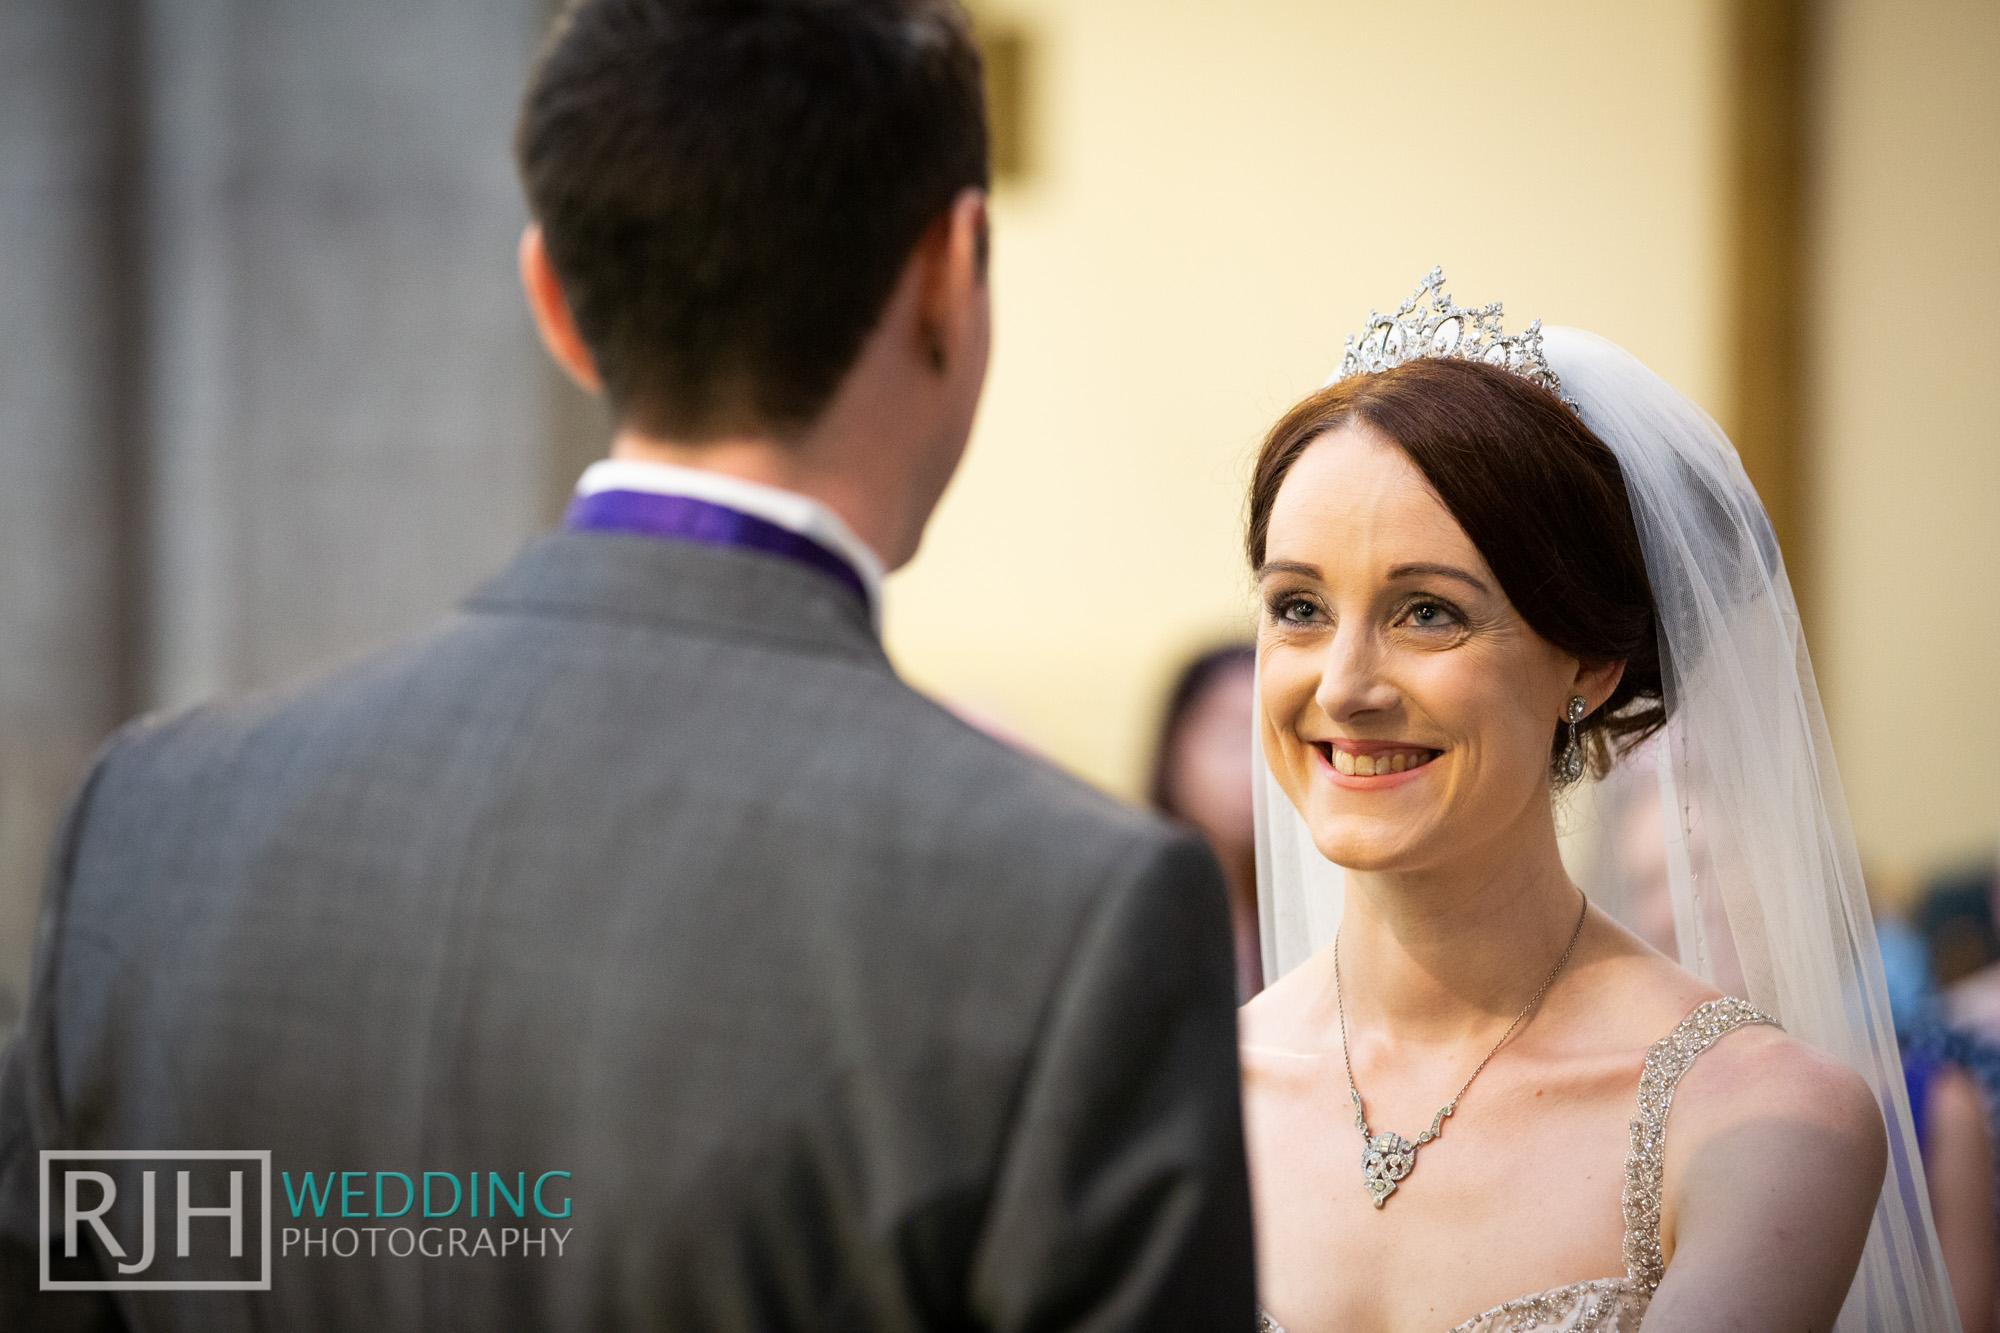 Oulton Hall Wedding Photography_Goodwill-Hall_022_RJH17385.jpg